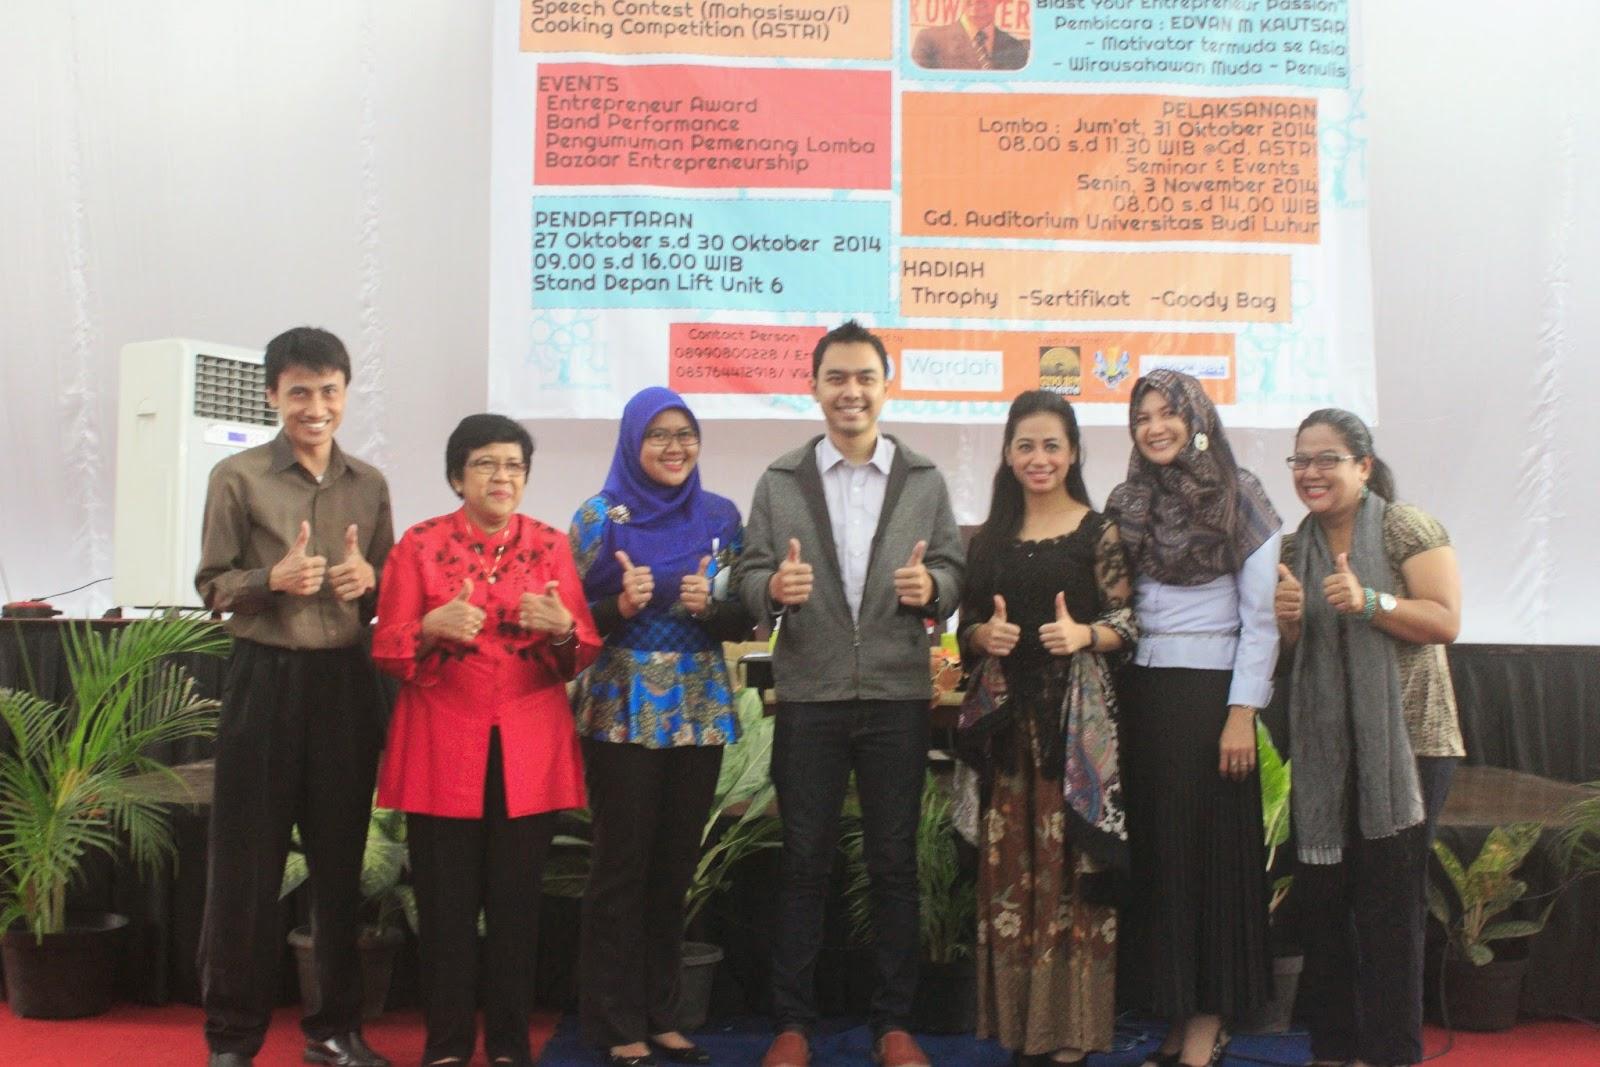 edvan m kautsar, motivator muda, motivator indonesia, motivator top, inspirator, pengusaha muda, sukses muda, seminar motivasi, training motivasi